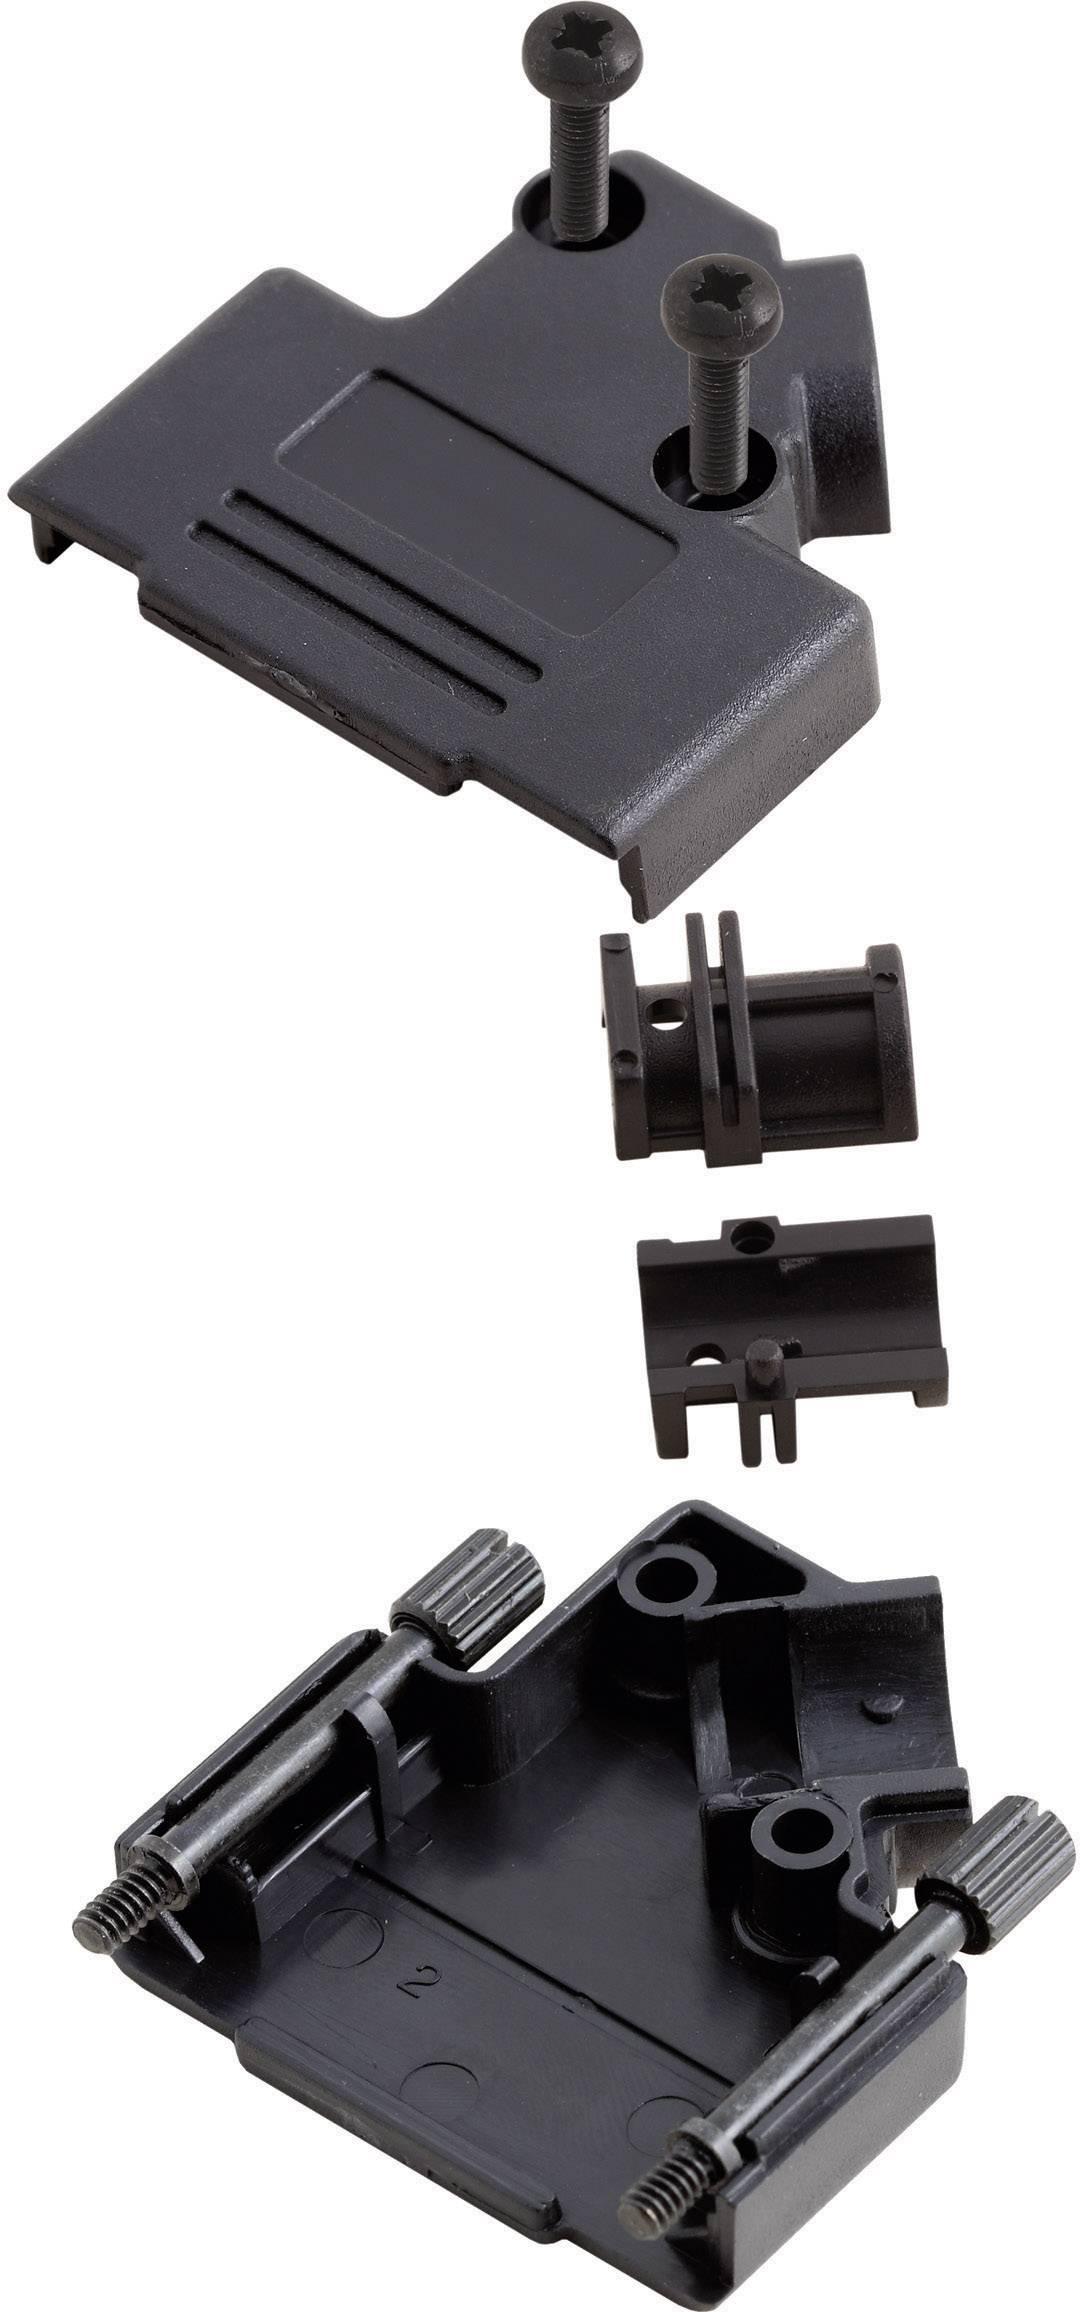 D-SUB púzdro MH Connectors MHD45PPK-09-BK-K 6560-0107-11, Počet pinov: 9, plast, 45 °, čierna, 1 ks